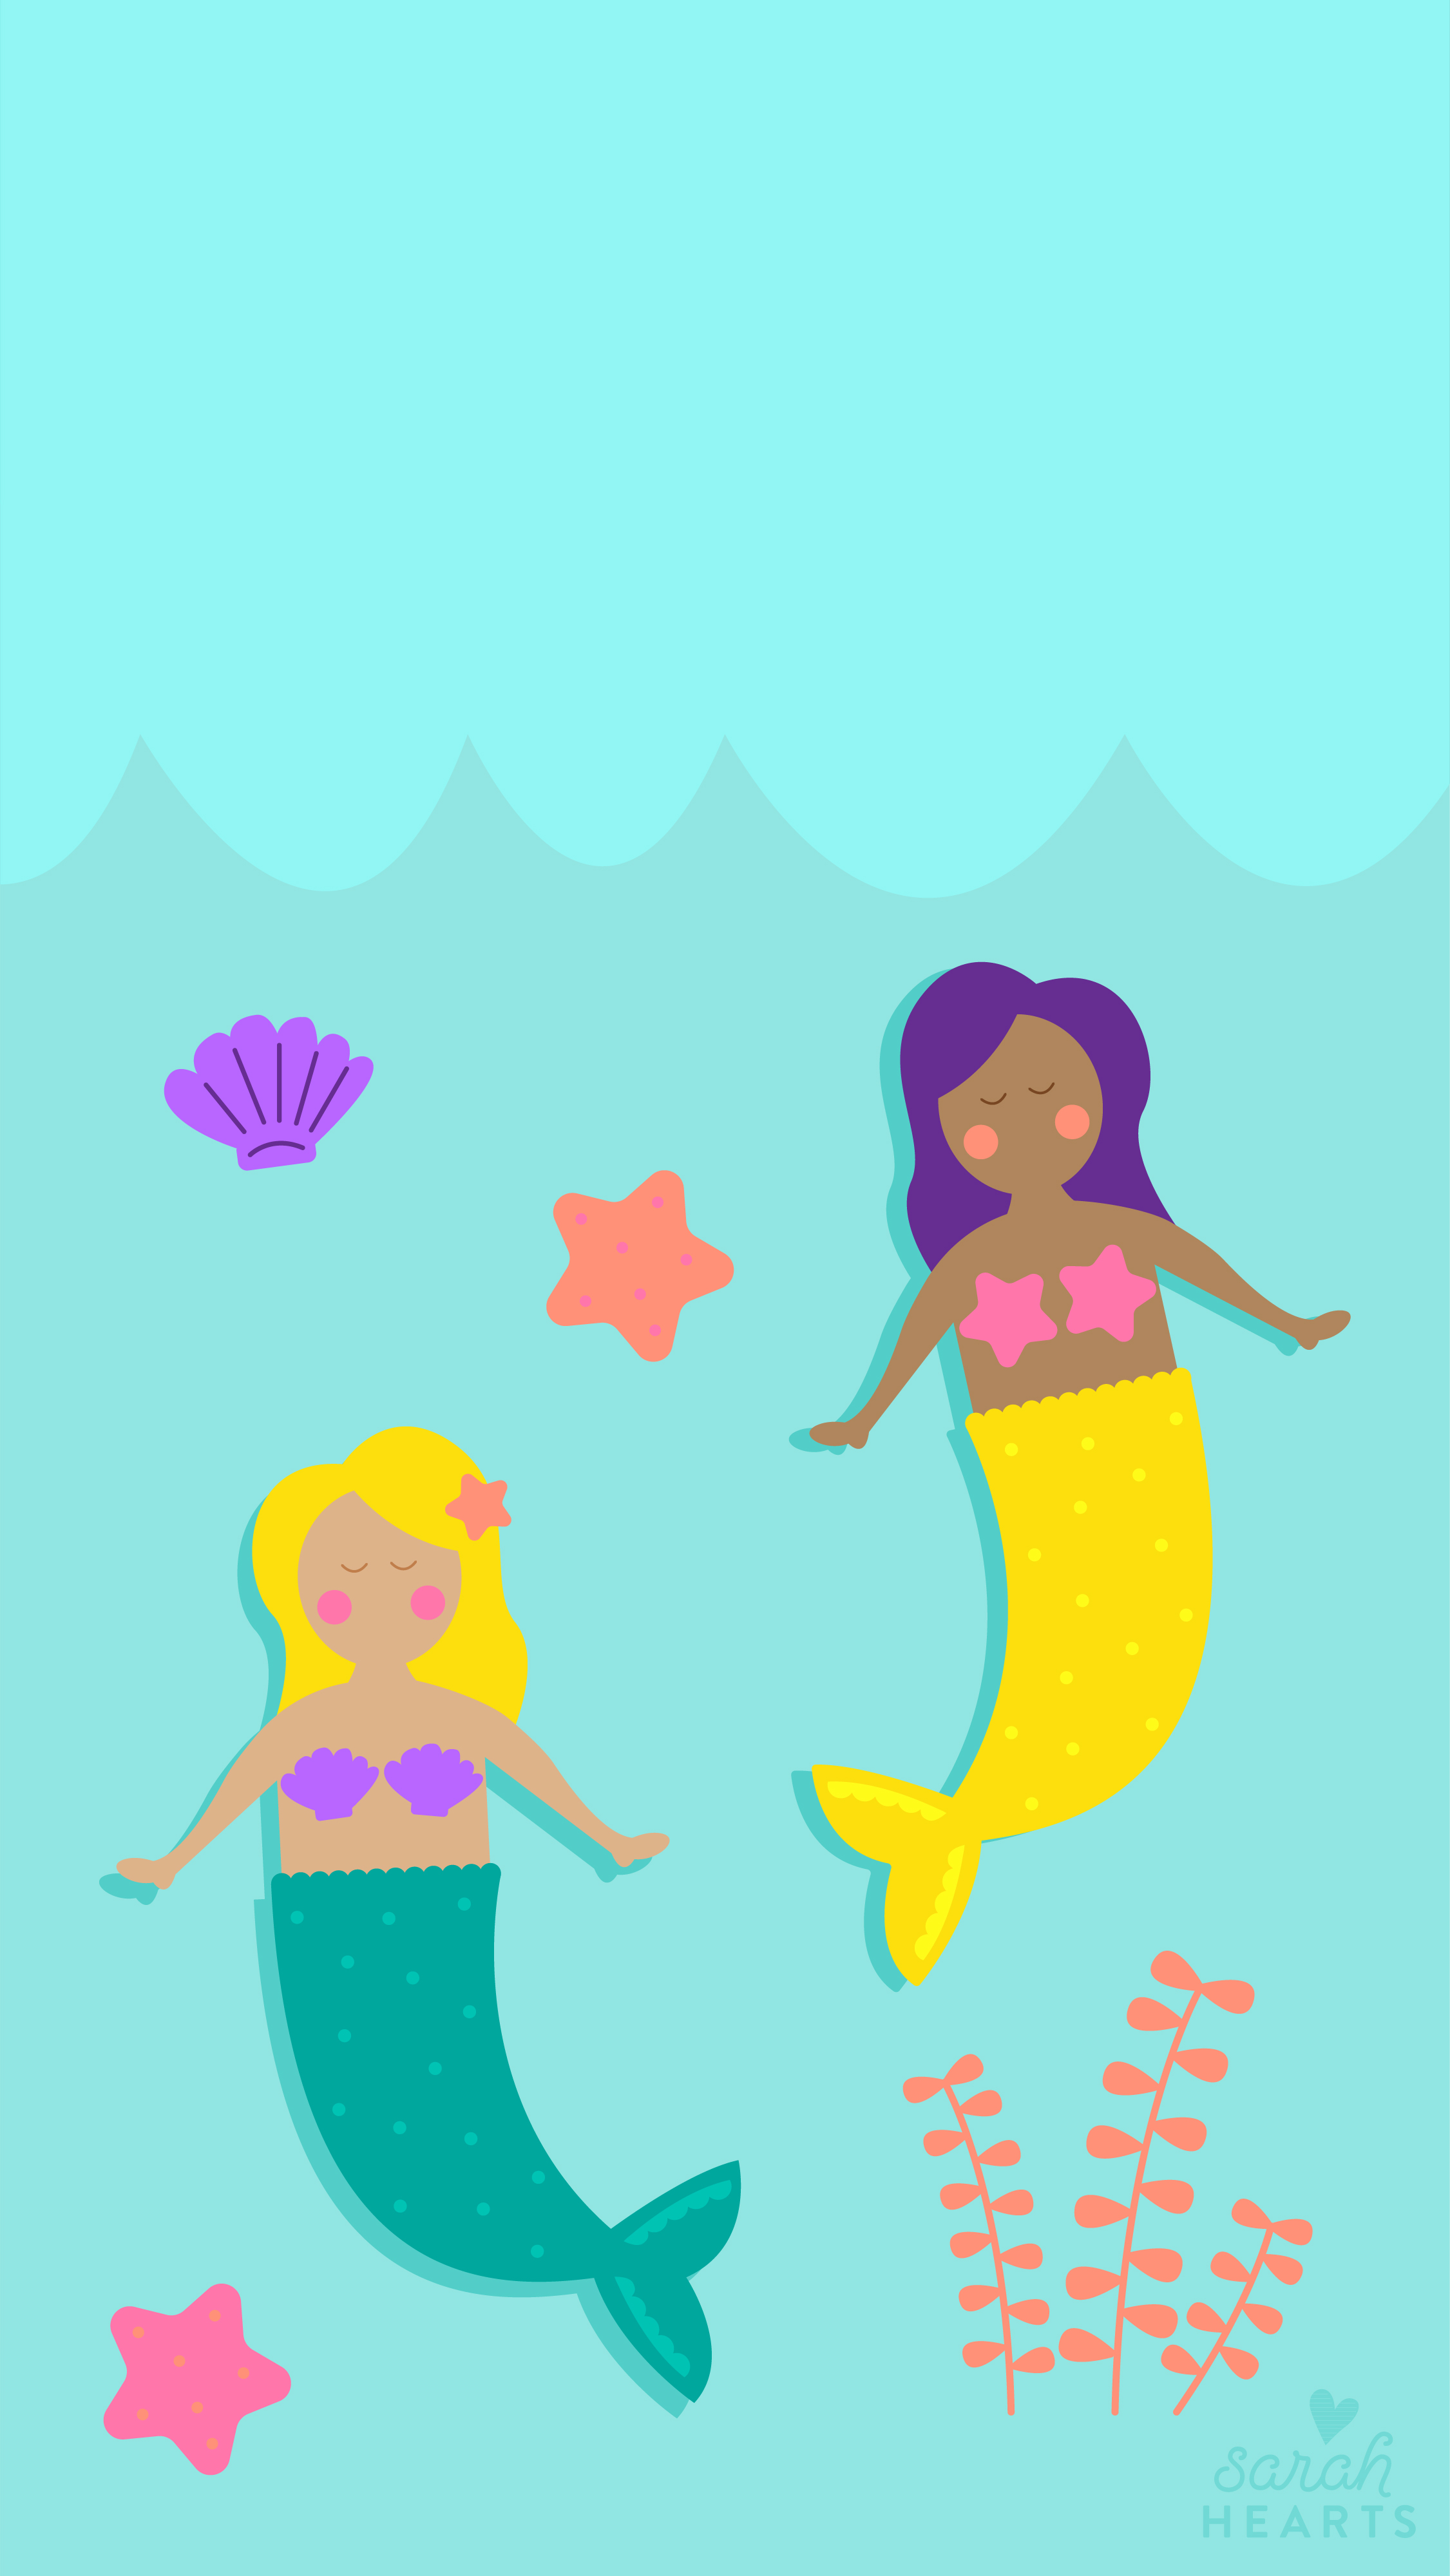 The Little Mermaid Quote Iphone Wallpaper July 2017 Mermaid Calendar Wallpaper Sarah Hearts